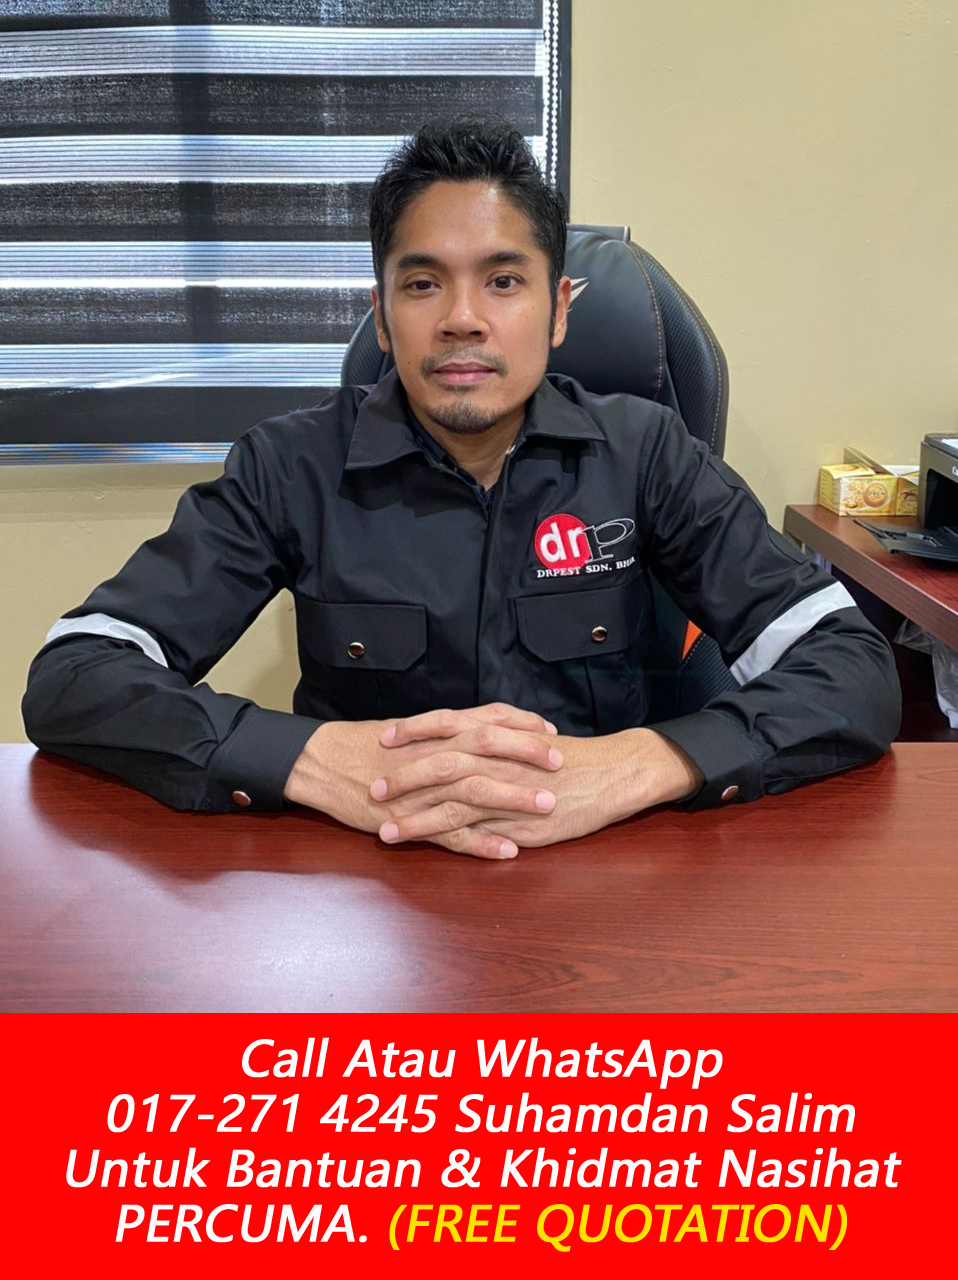 drpest sdn bhd drp maintenance and services syarikat kawalan serangga bumiputra yang berlesen the best company pest control near me area Bukit Tunku kl near me